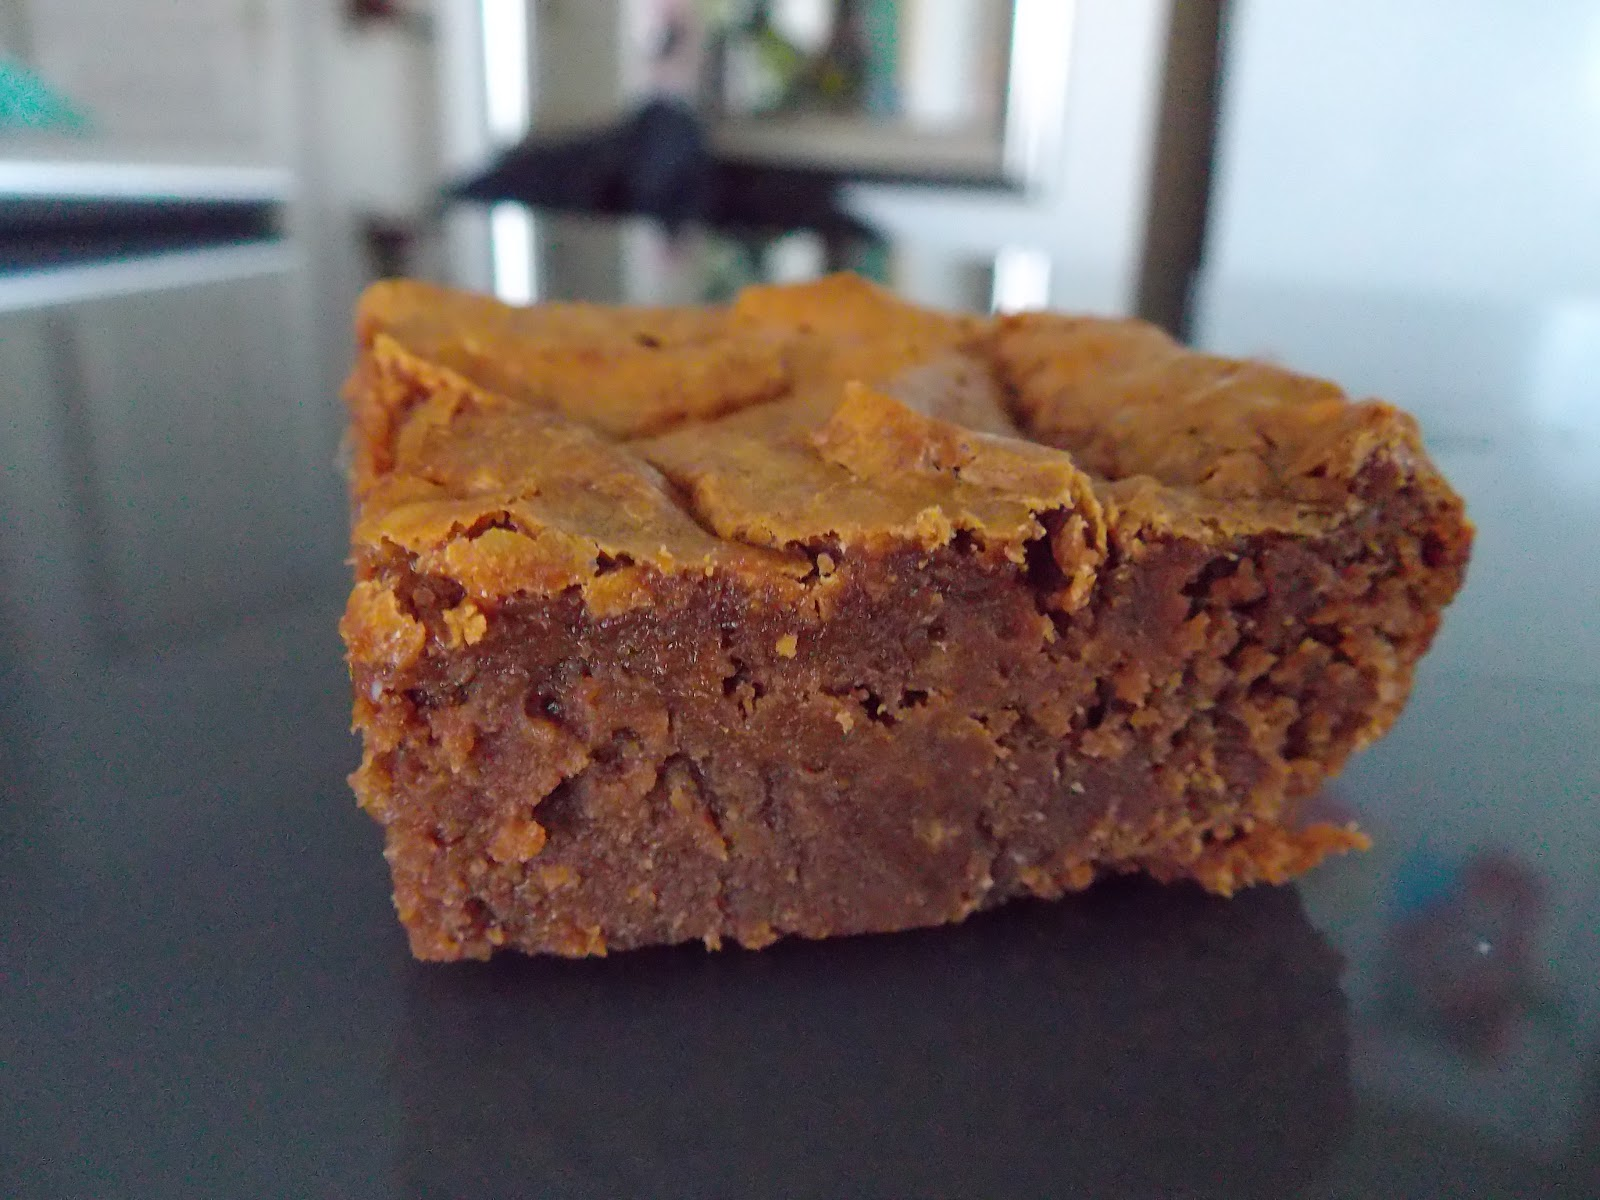 gateau gaga love cakes brownie sans gras. Black Bedroom Furniture Sets. Home Design Ideas